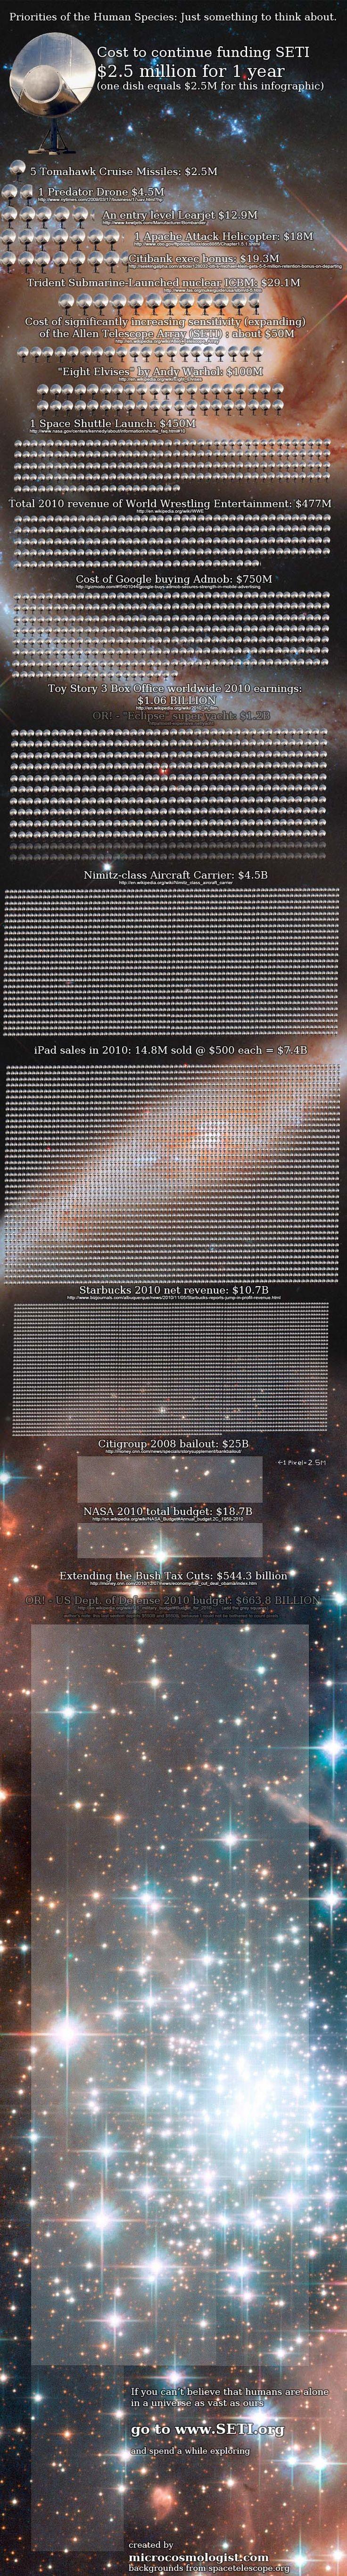 A SETI Infographic